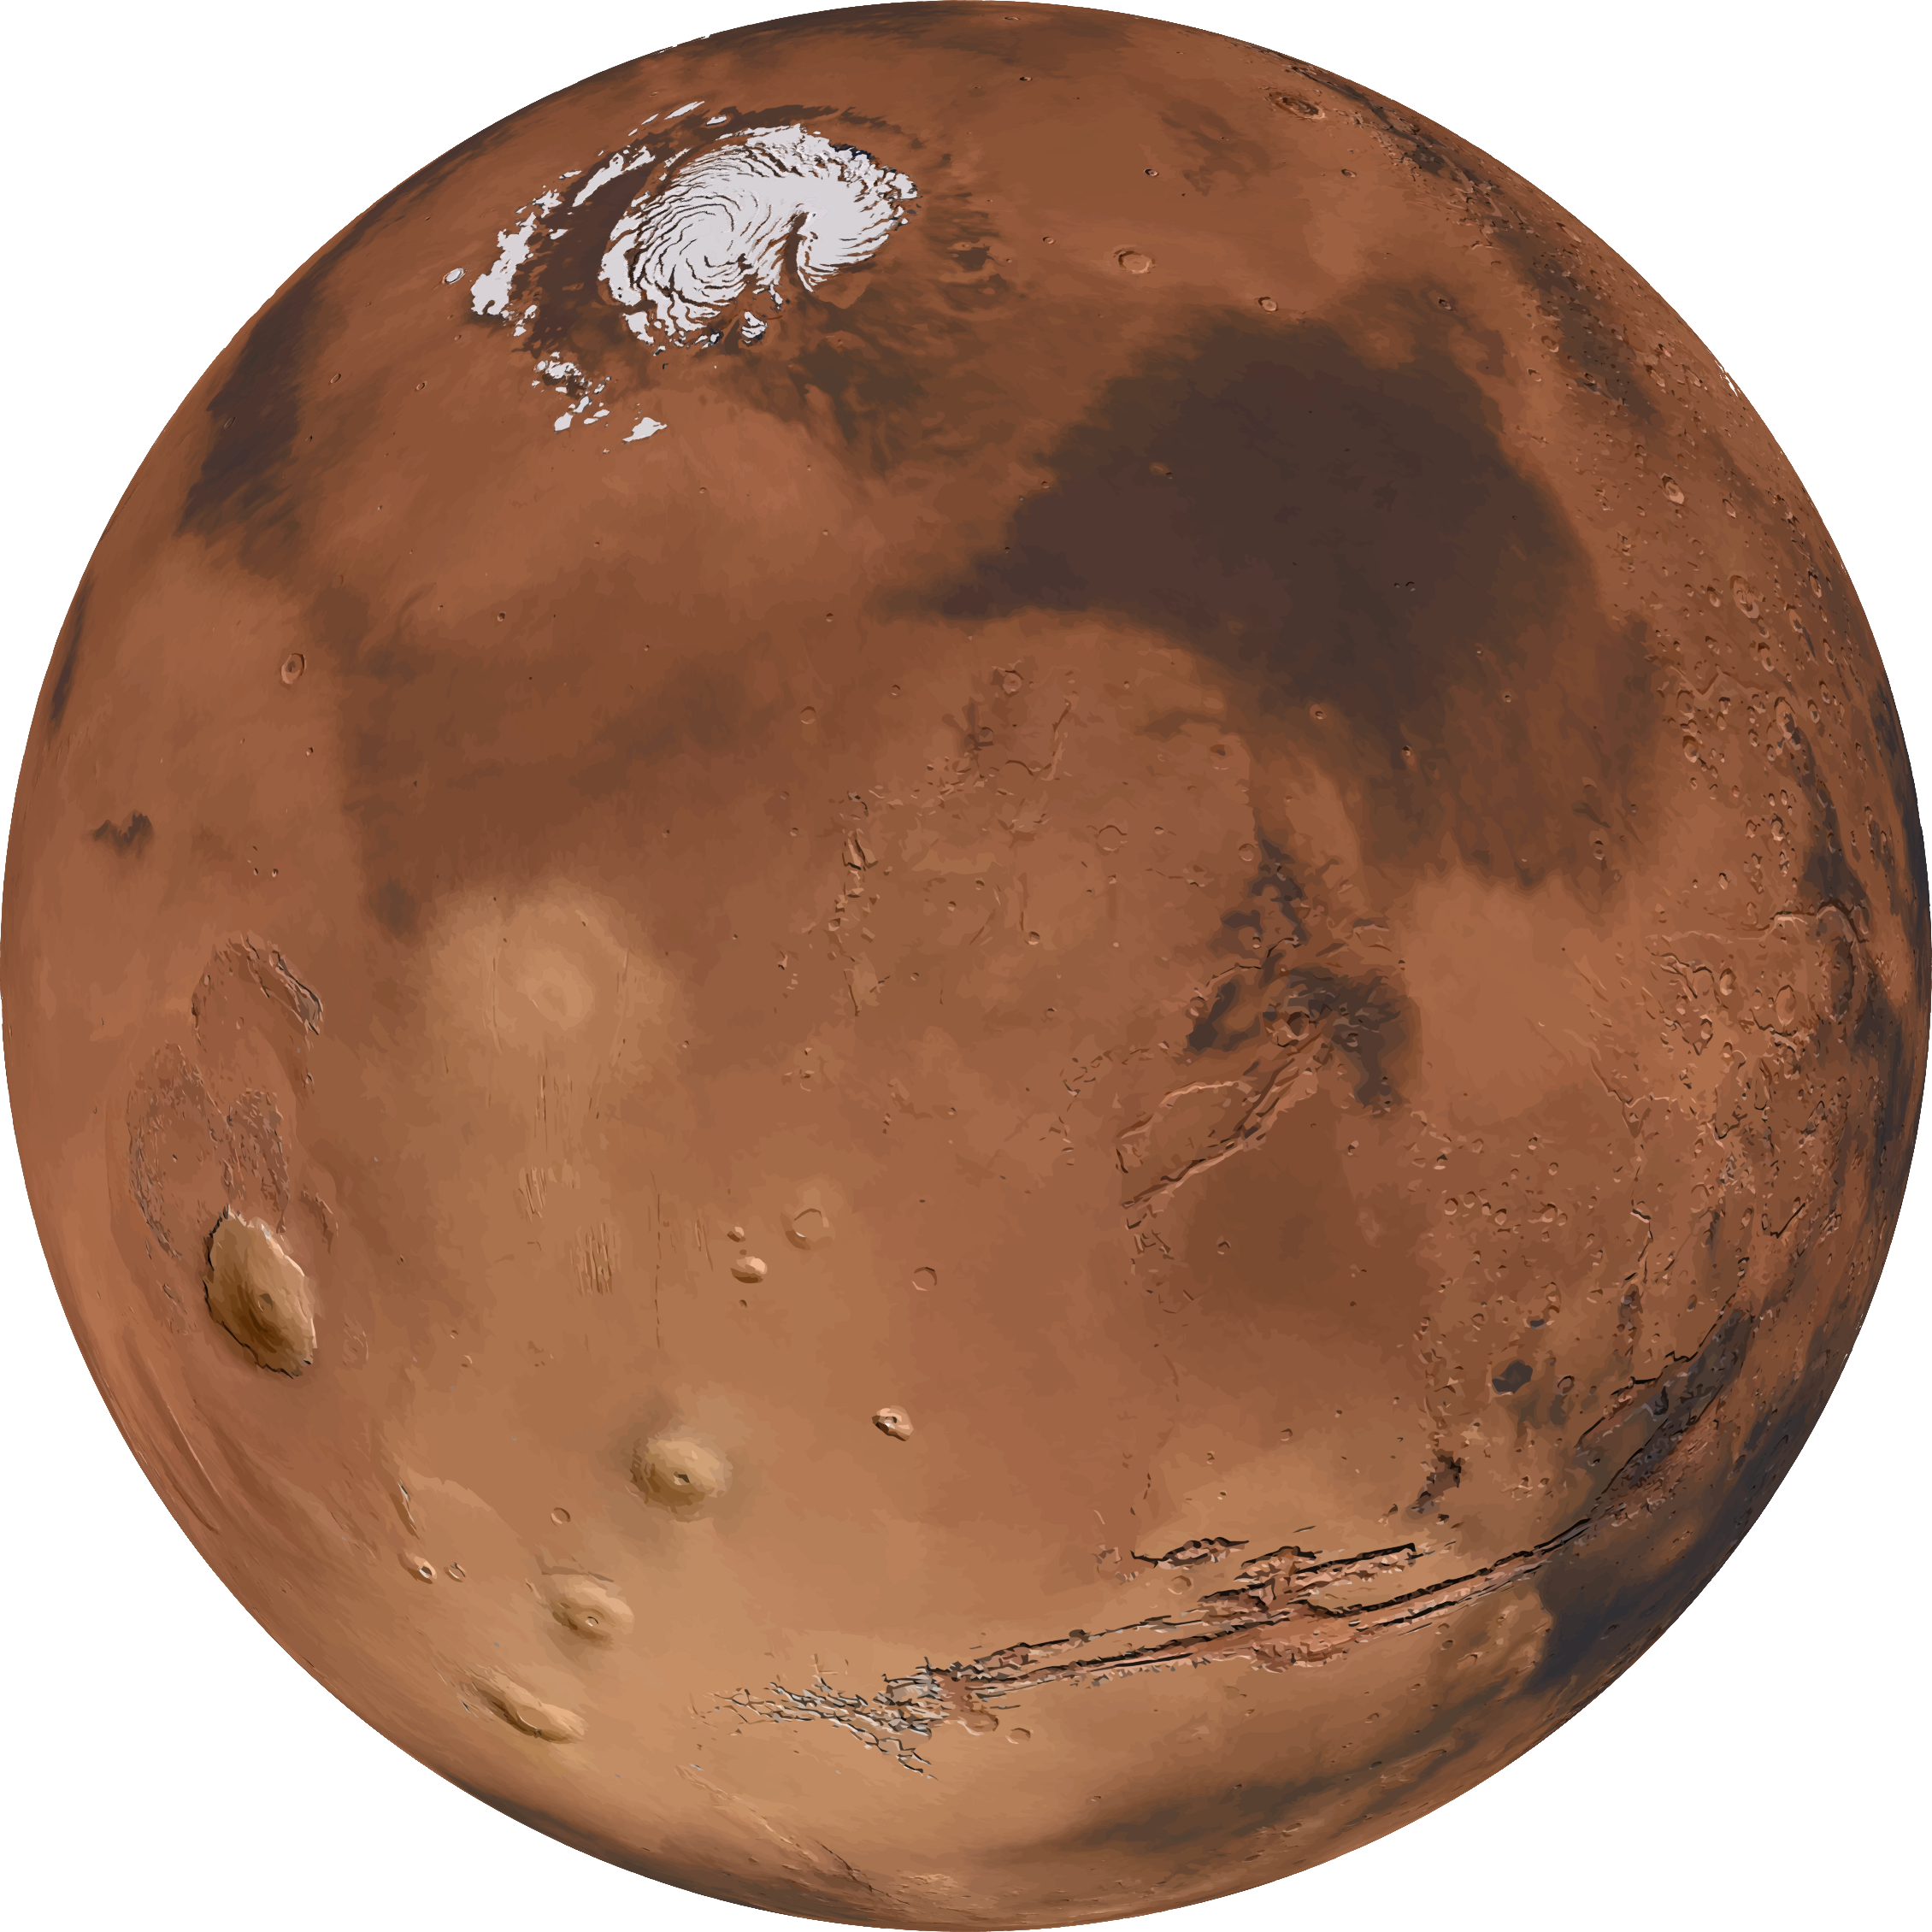 image freeuse D globe big image. Mars clipart.